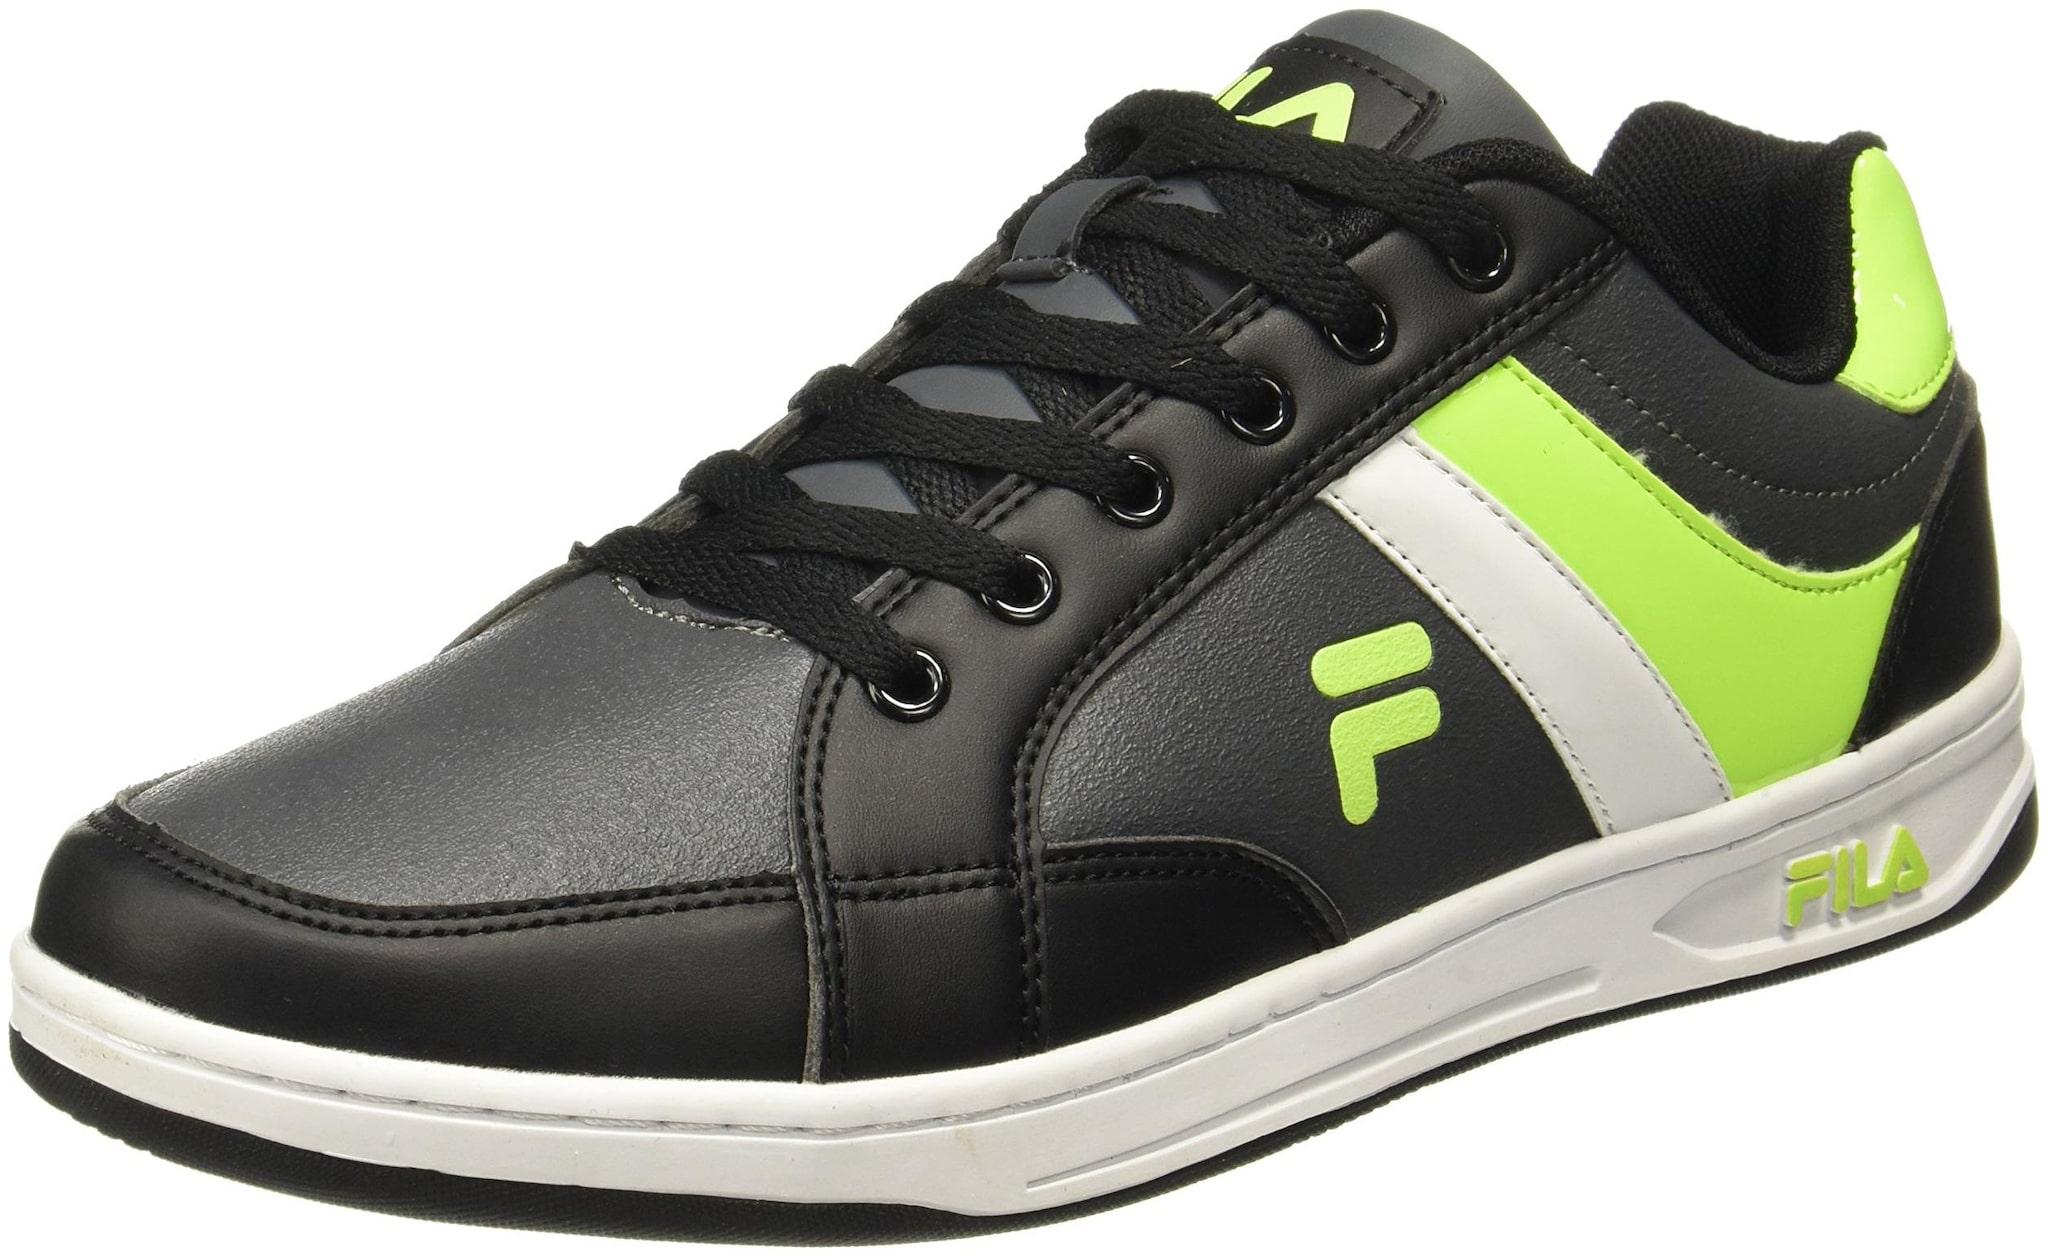 fila hexo price Sale Fila Shoes, Fila